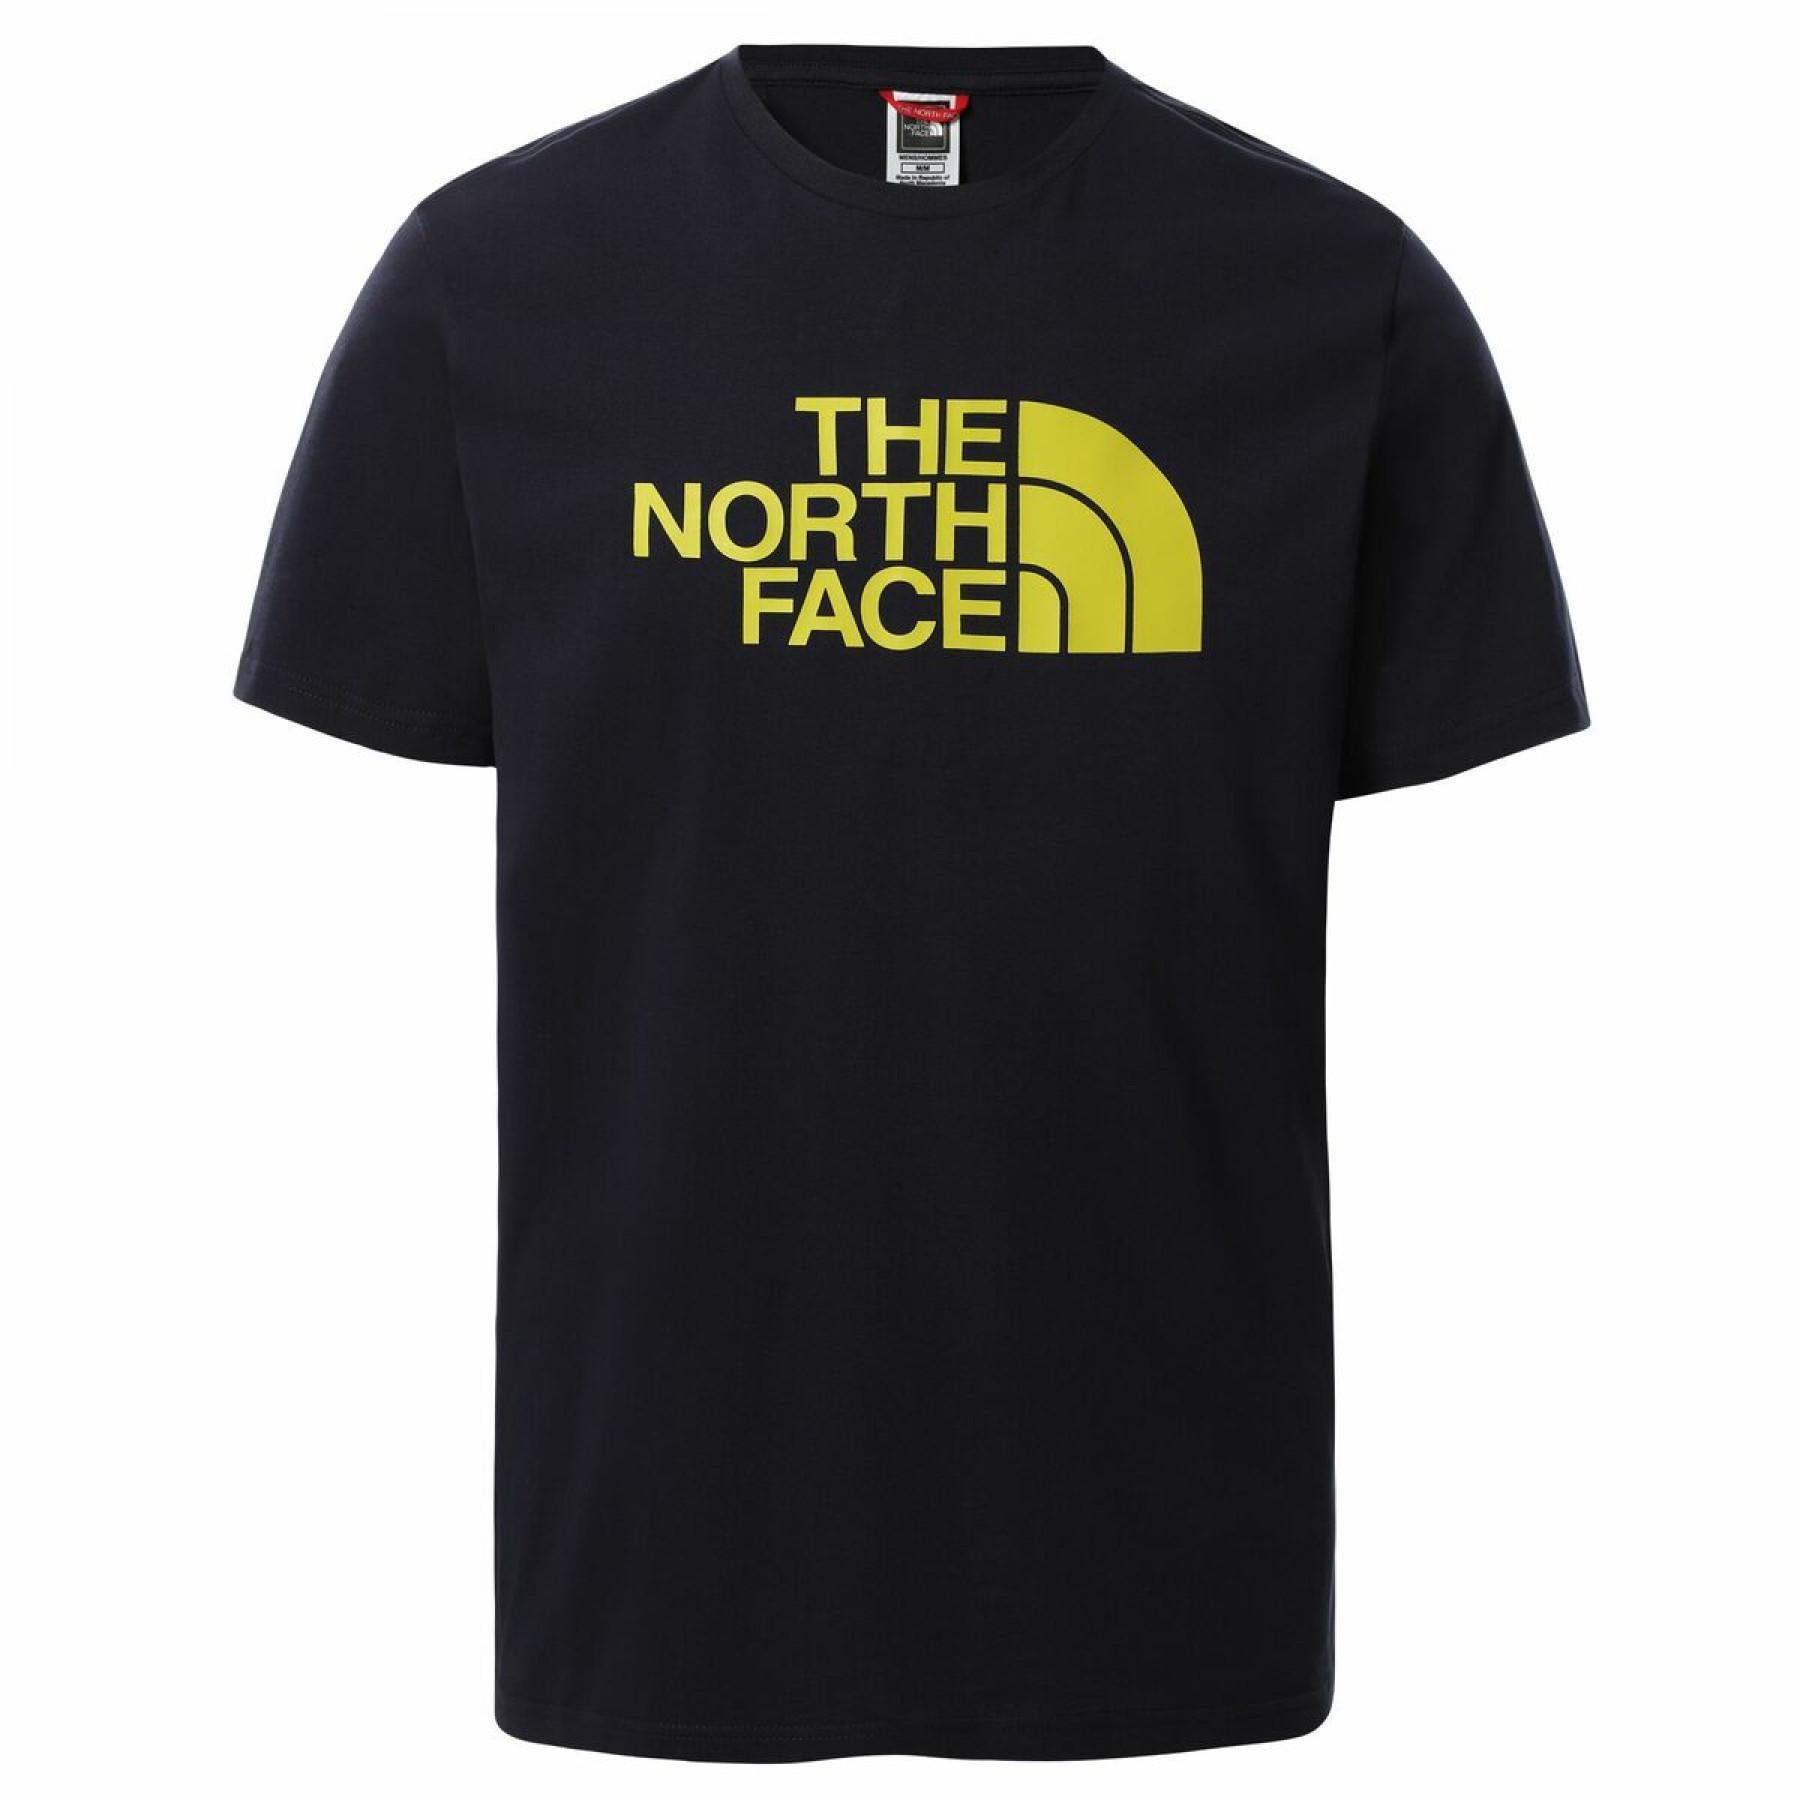 The North Face Leichtes T-shirt